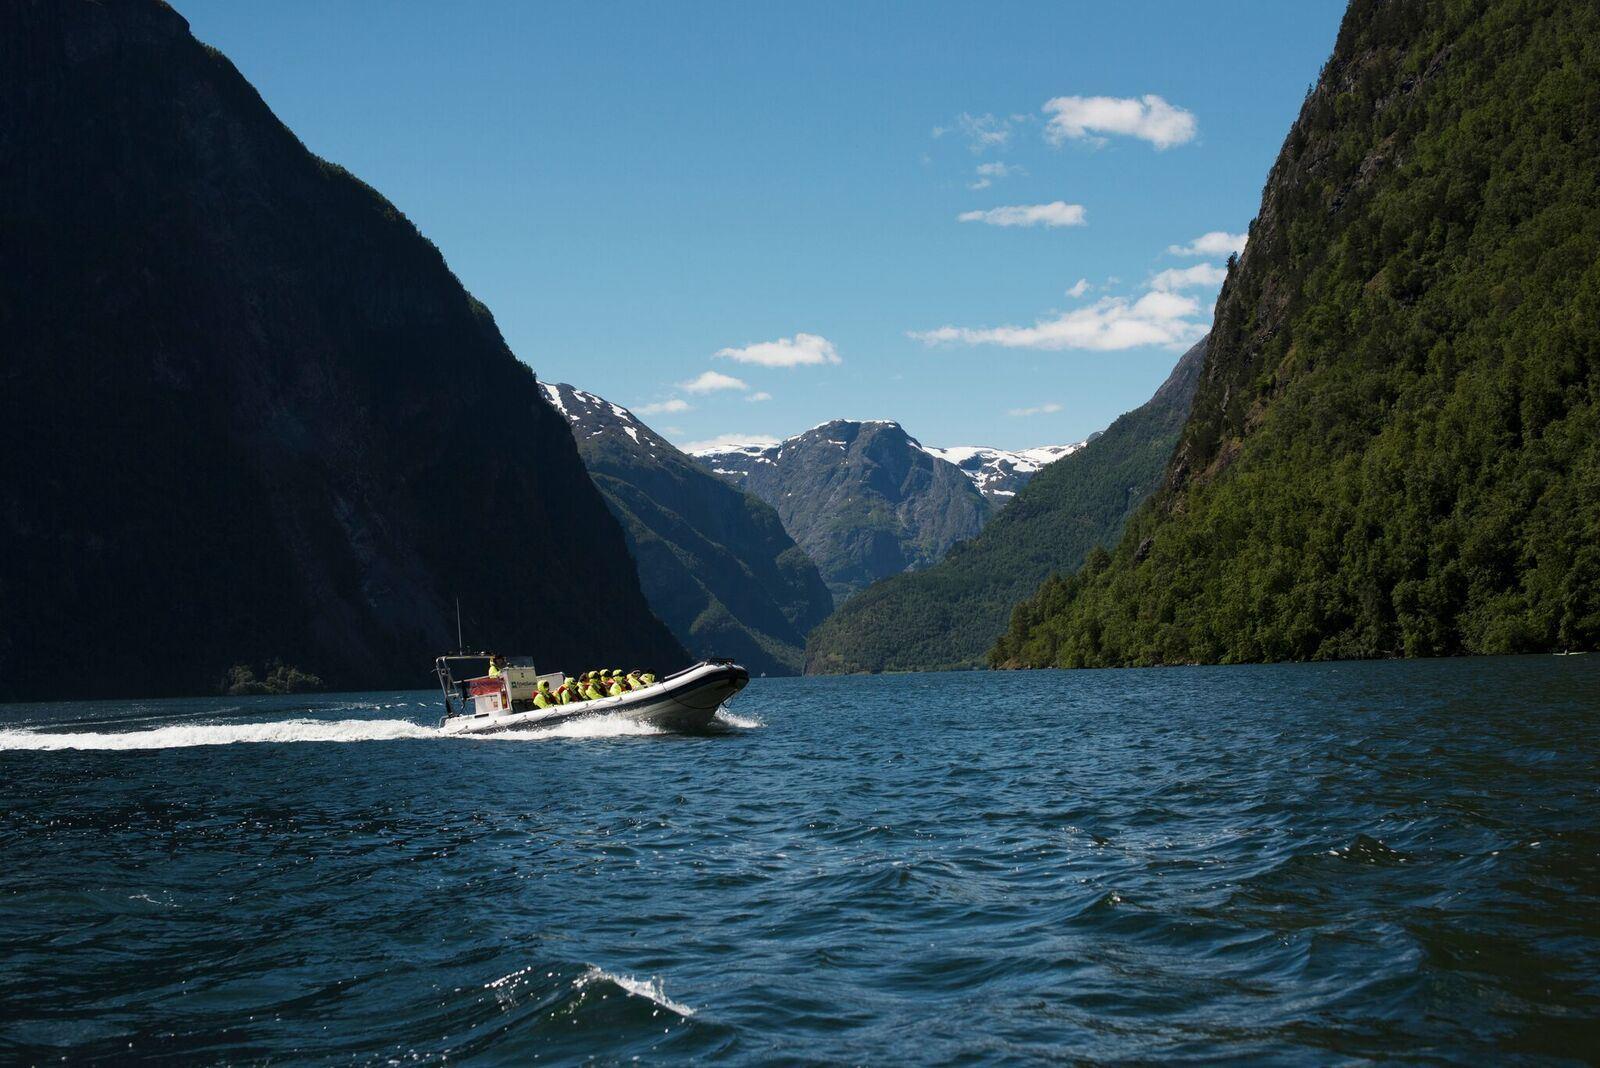 © Thea Hermansen, Heritage FjordSafari